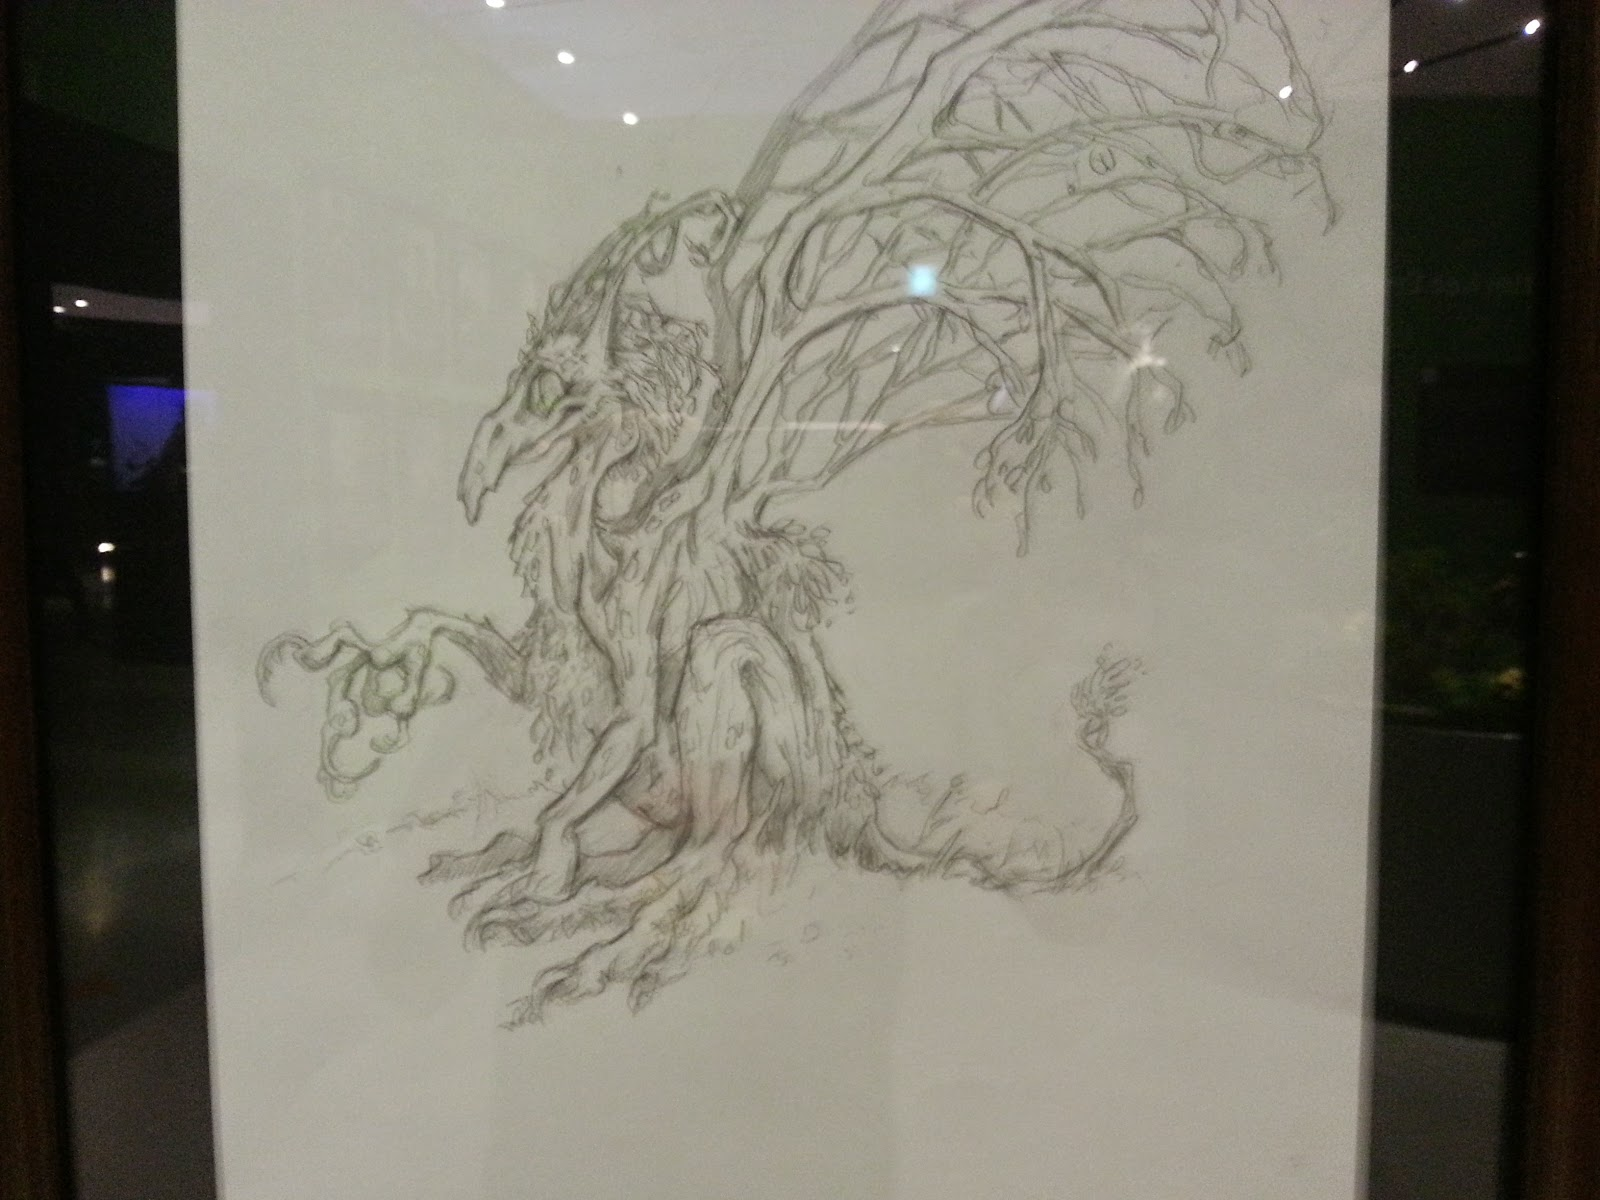 Pencil art plant dragaon?